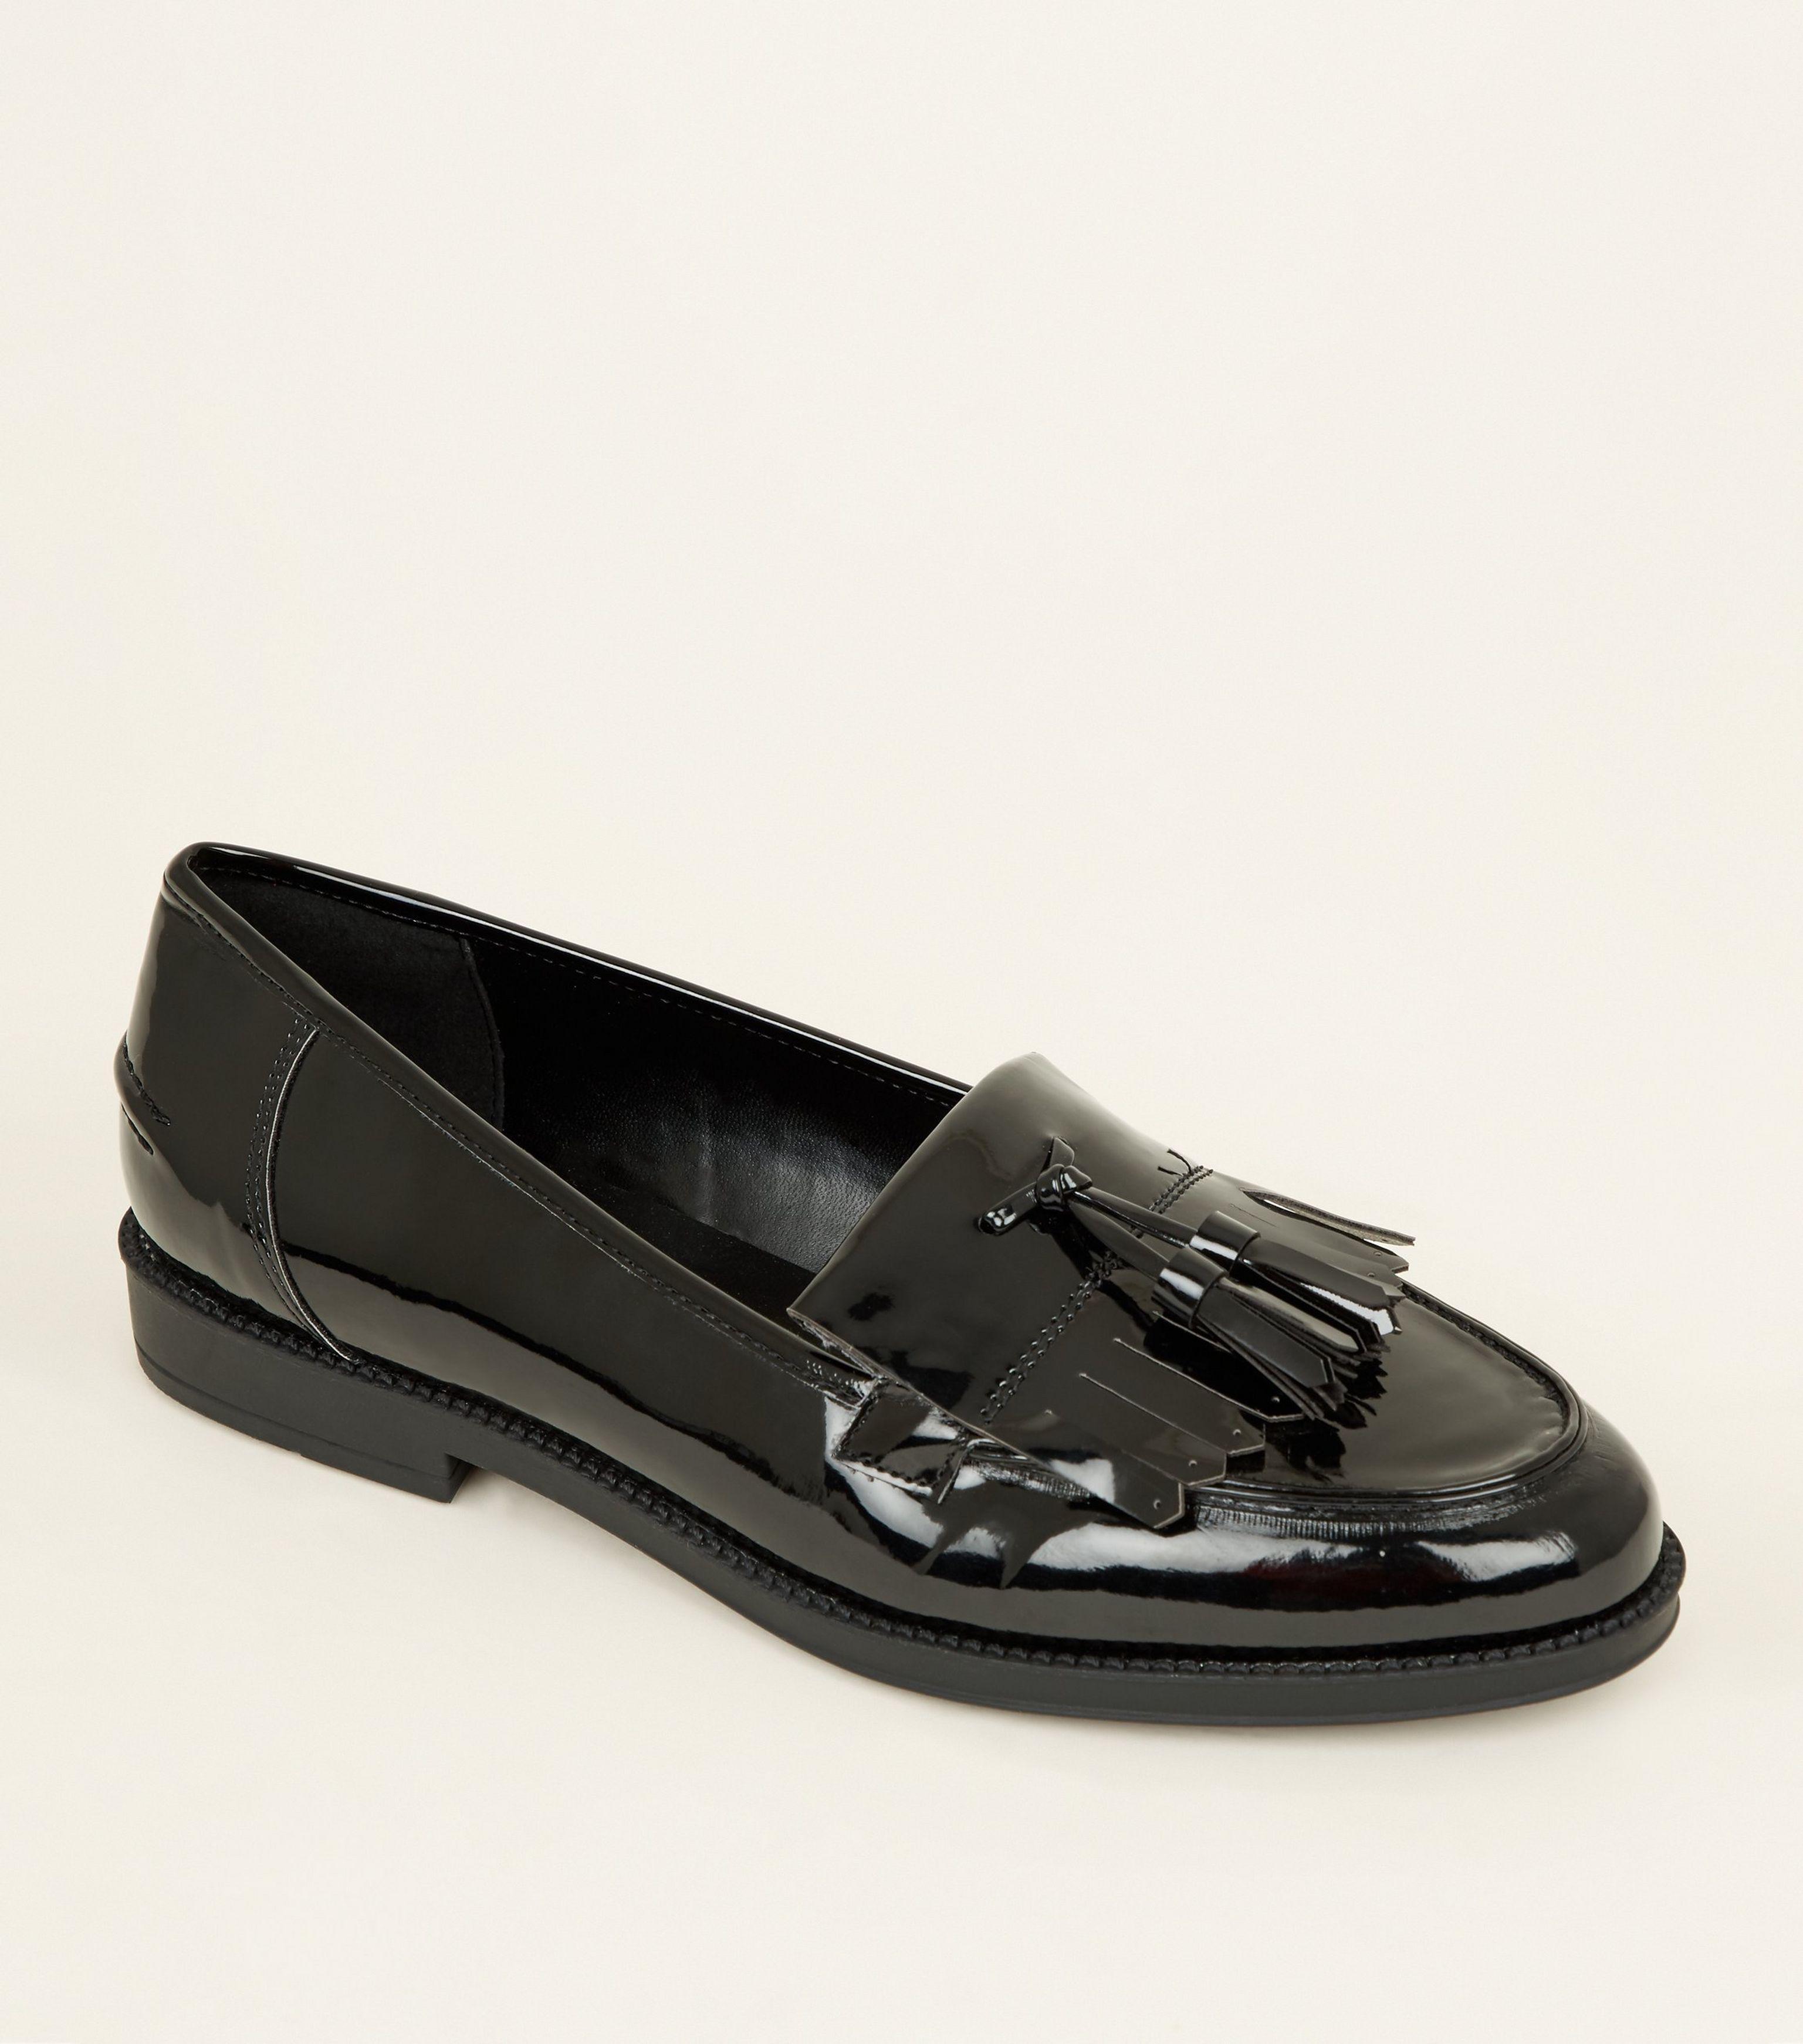 479c427fc17 New Look Black Patent Tassel Loafers in Black - Lyst